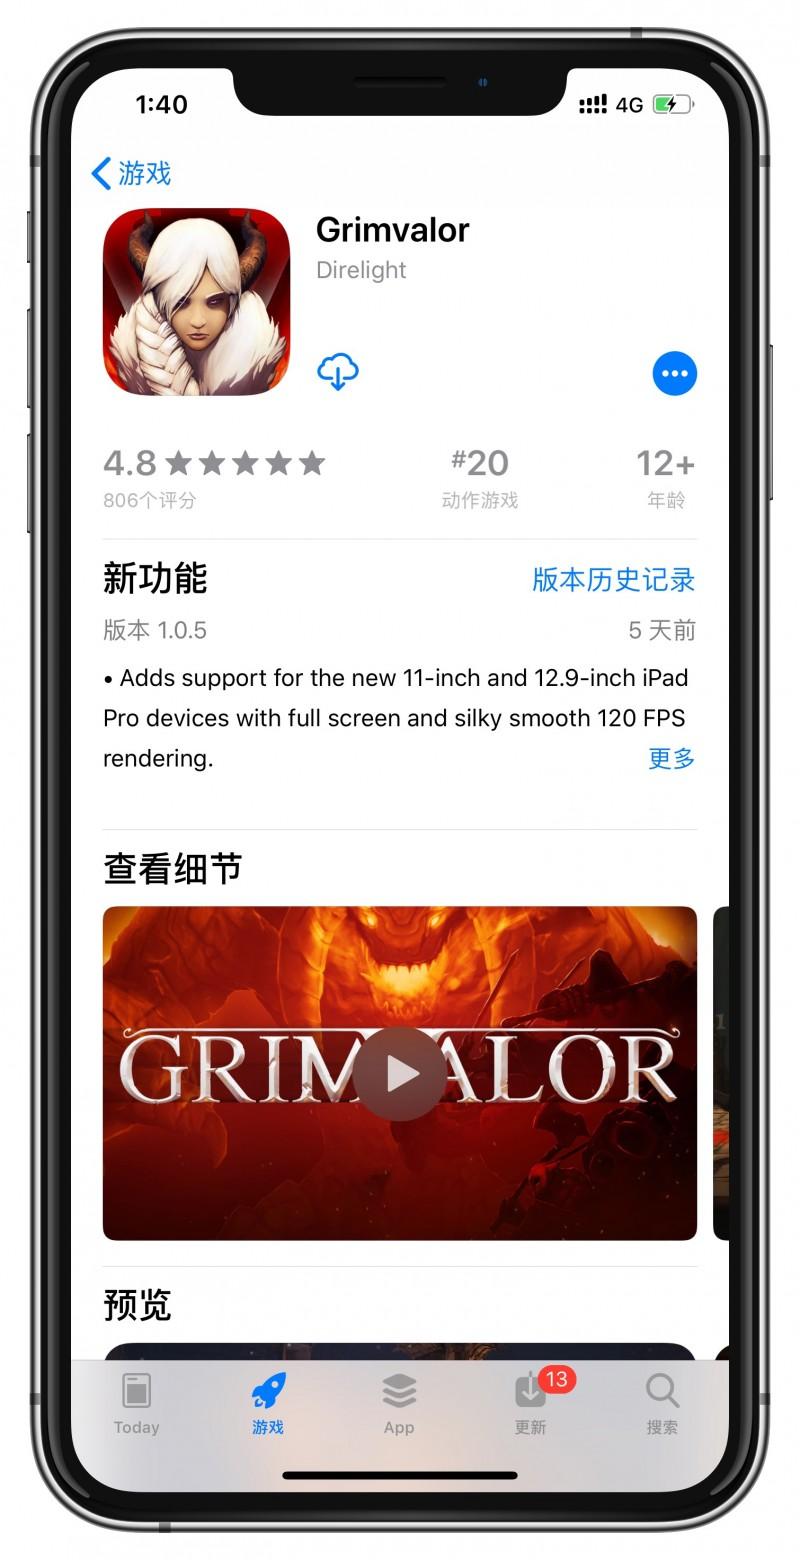 [已购]Grimvalor-草蜢资源